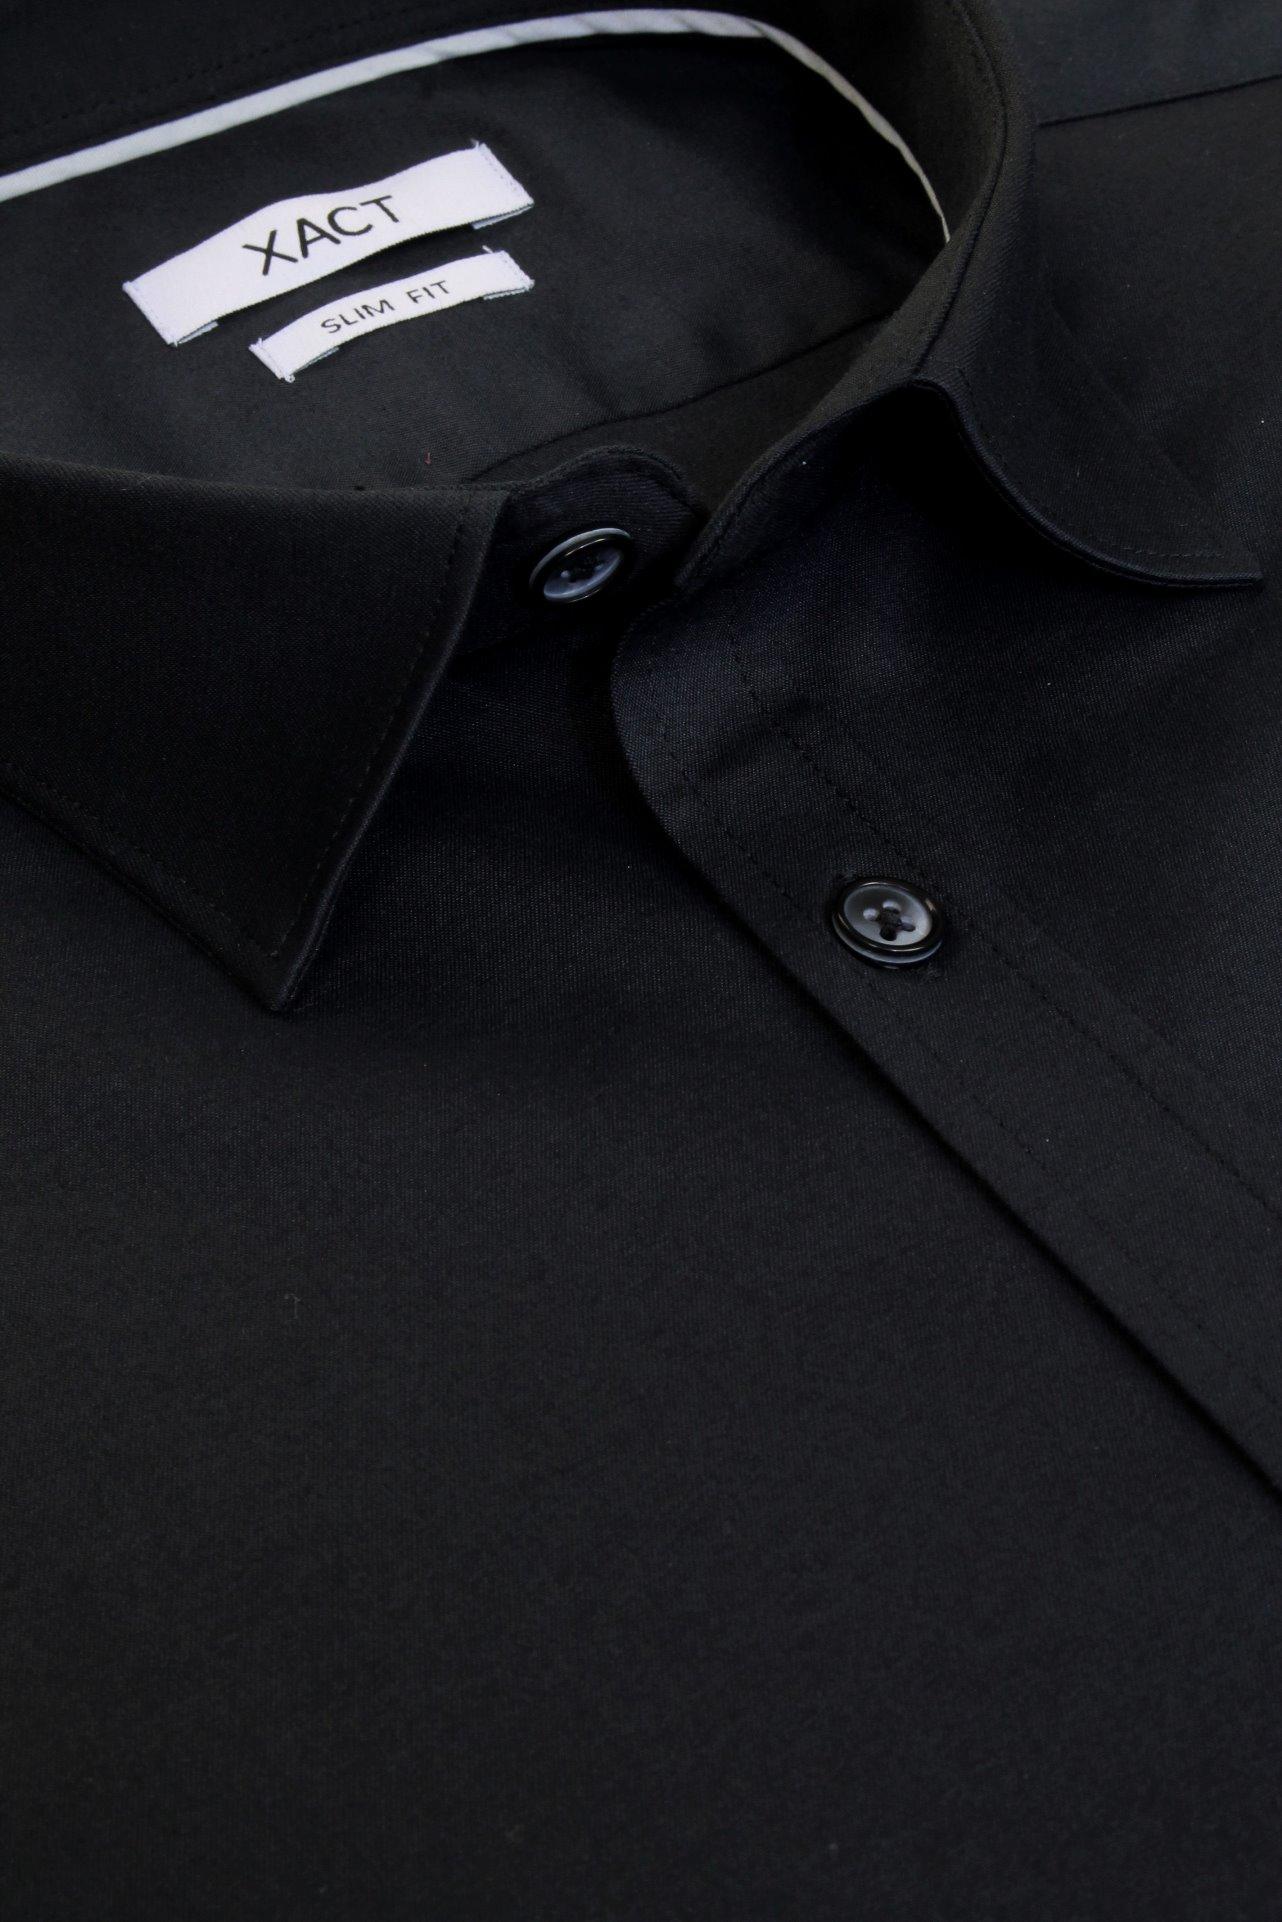 Xact-Mens-Long-Sleeved-Poplin-Stretch-Shirt-Slim-Fit miniatuur 7